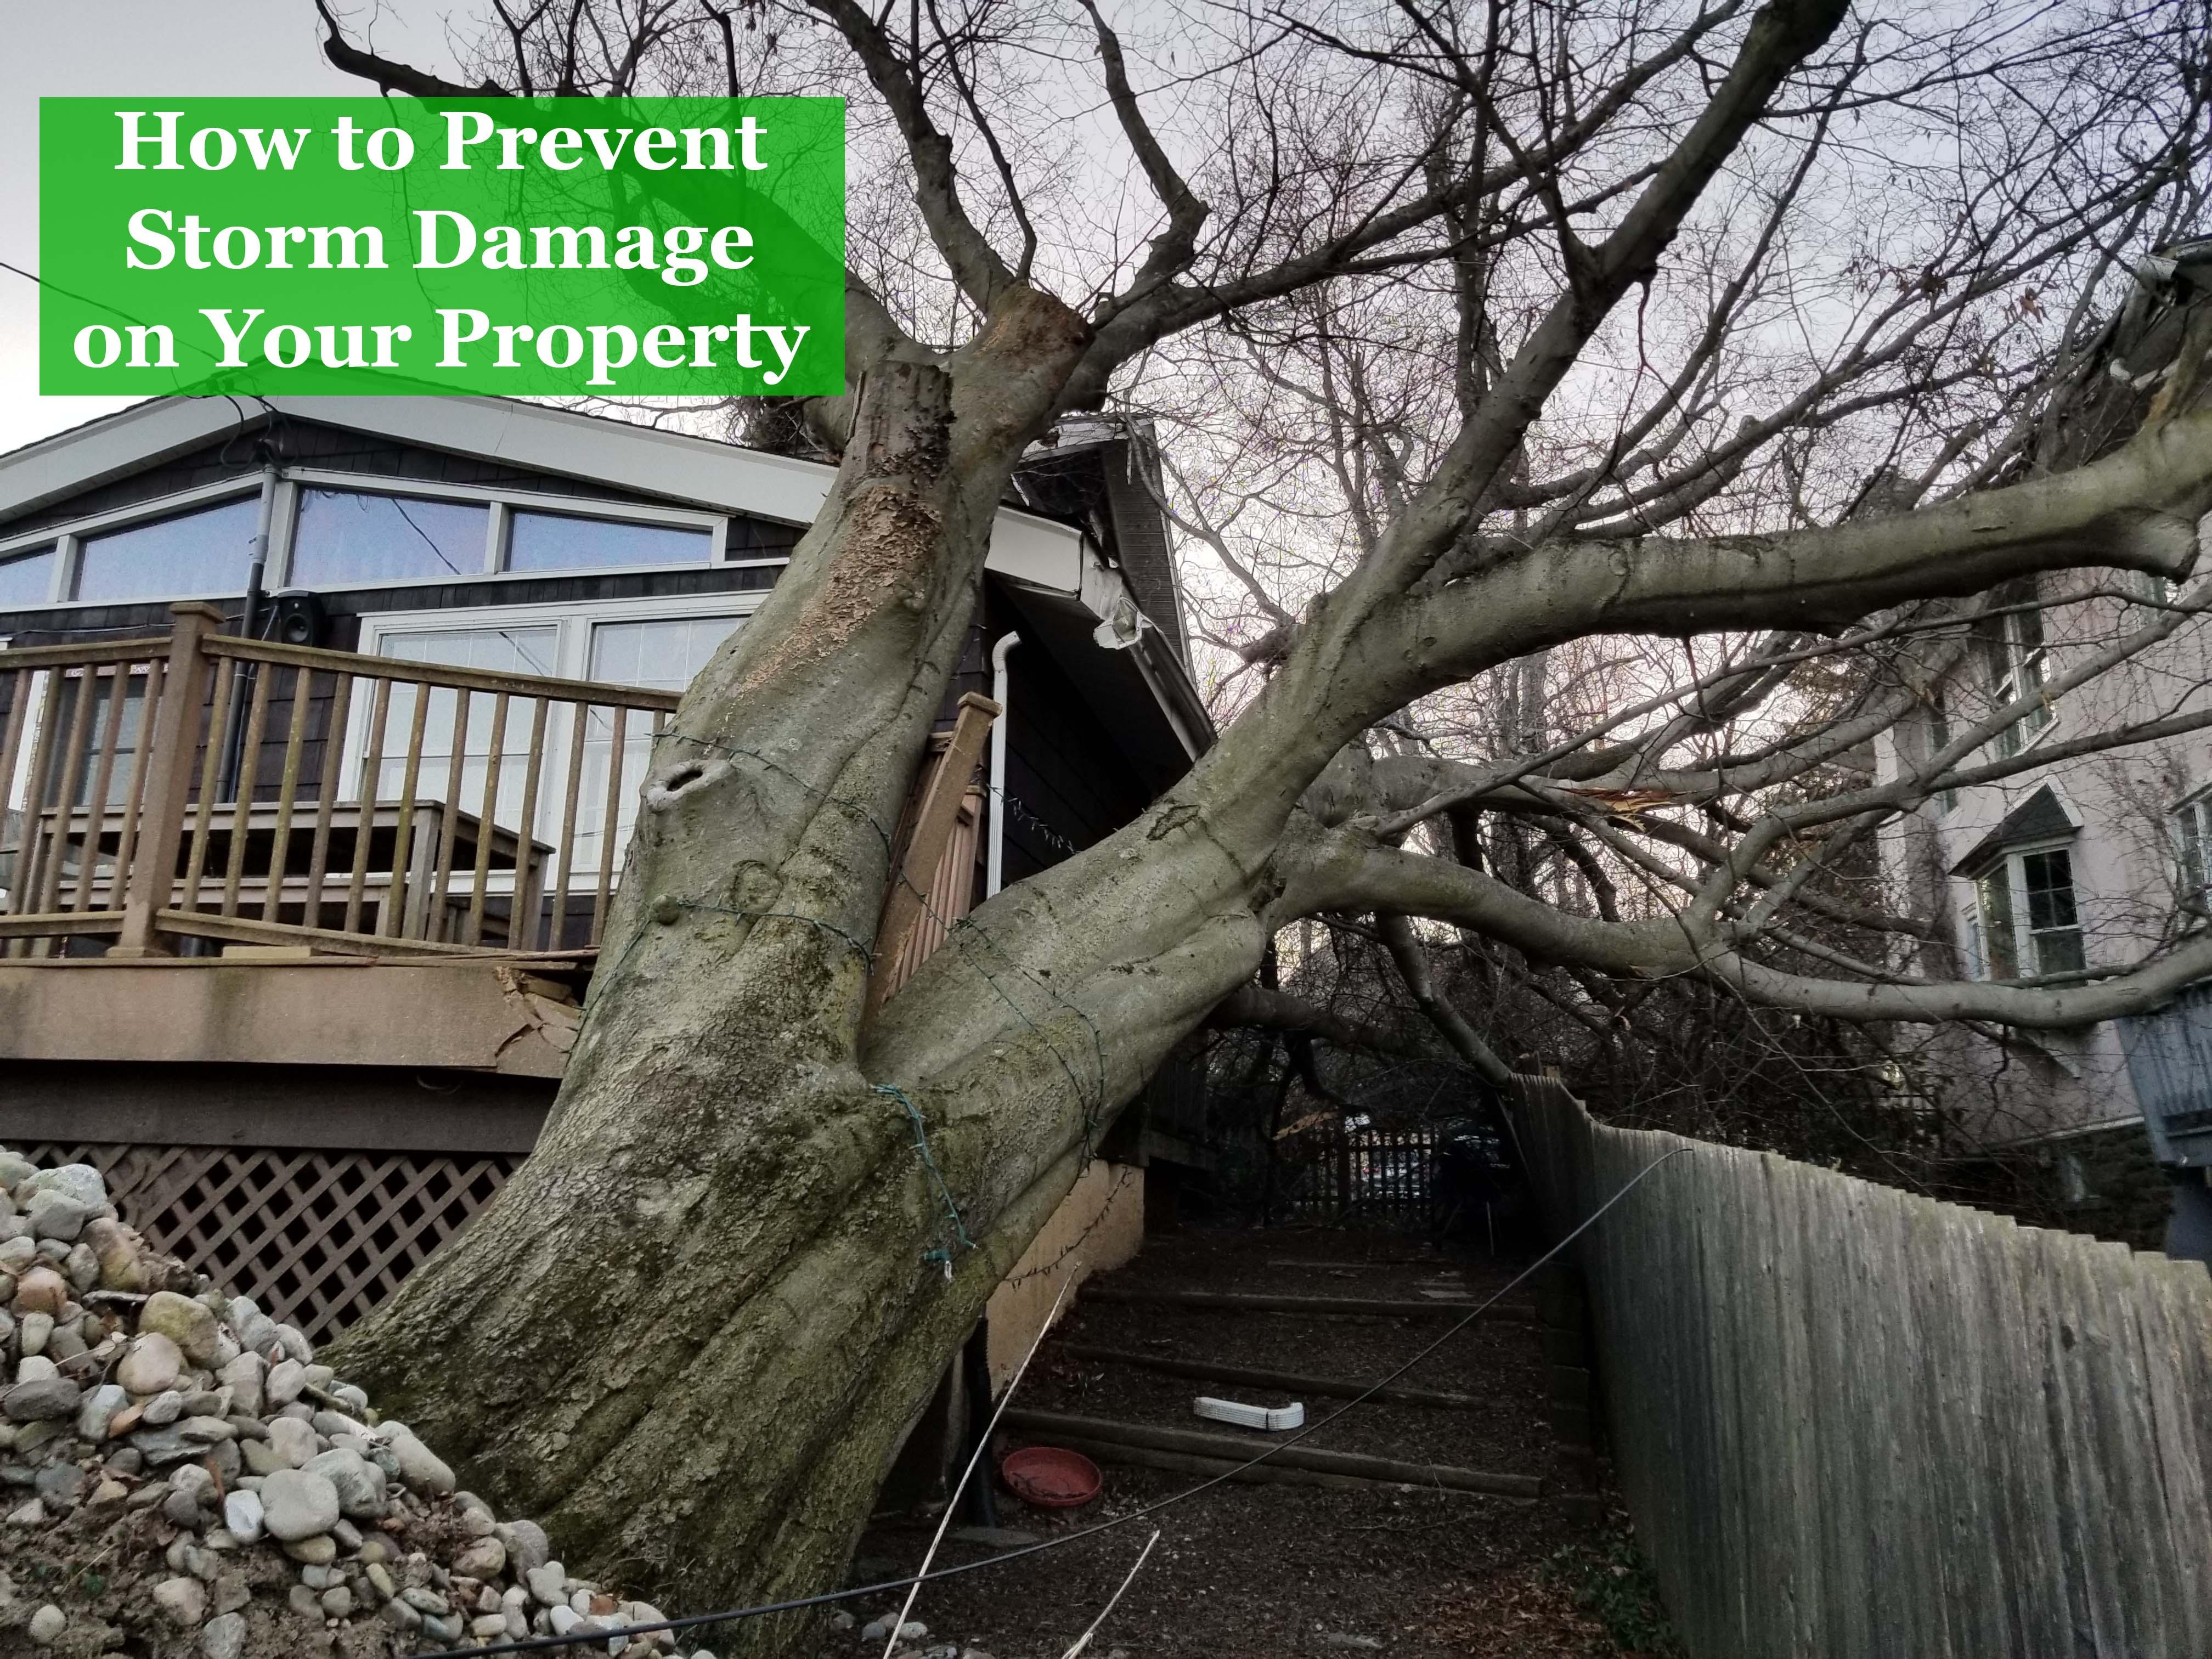 2018-How-To-Prevent-Storm-Damage-on-you-Property-Blog-Header.jpg